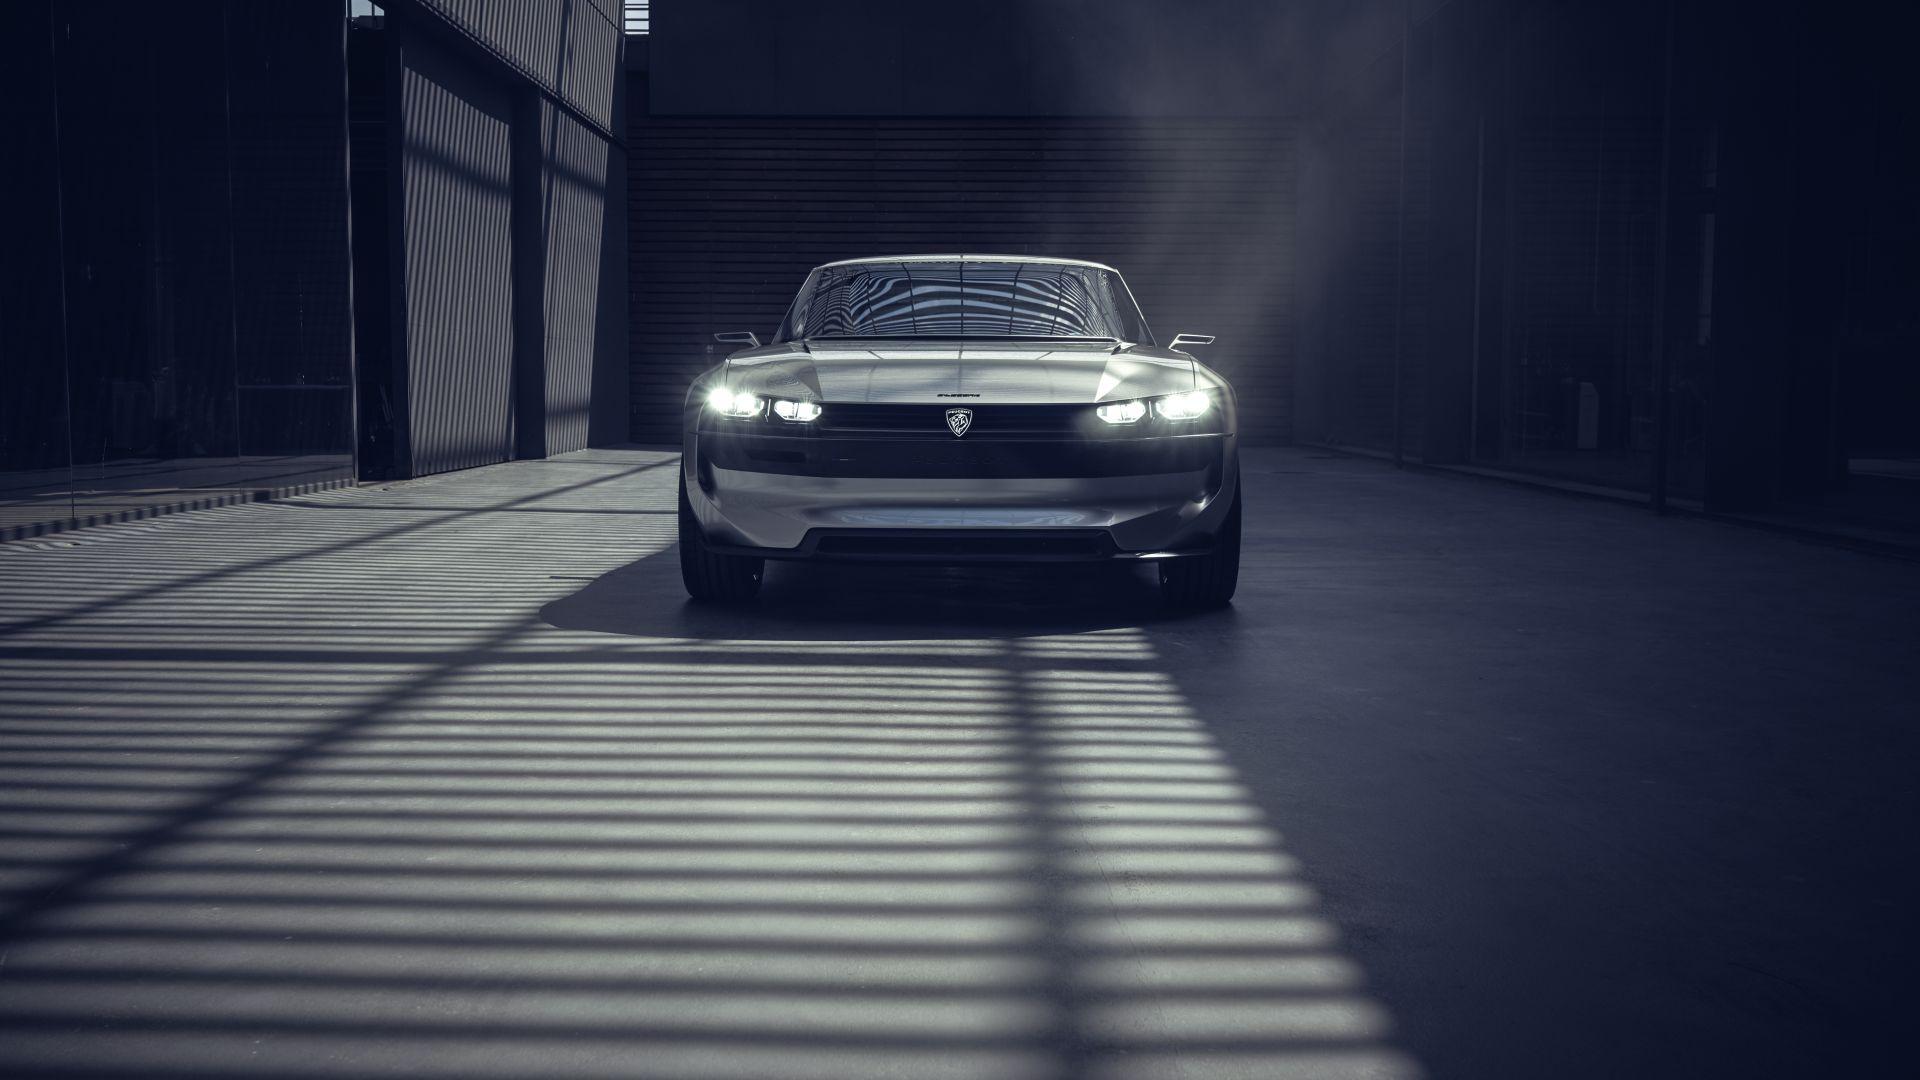 Wallpaper Peugeot E-Legend, Electric Cars, 4K, Cars